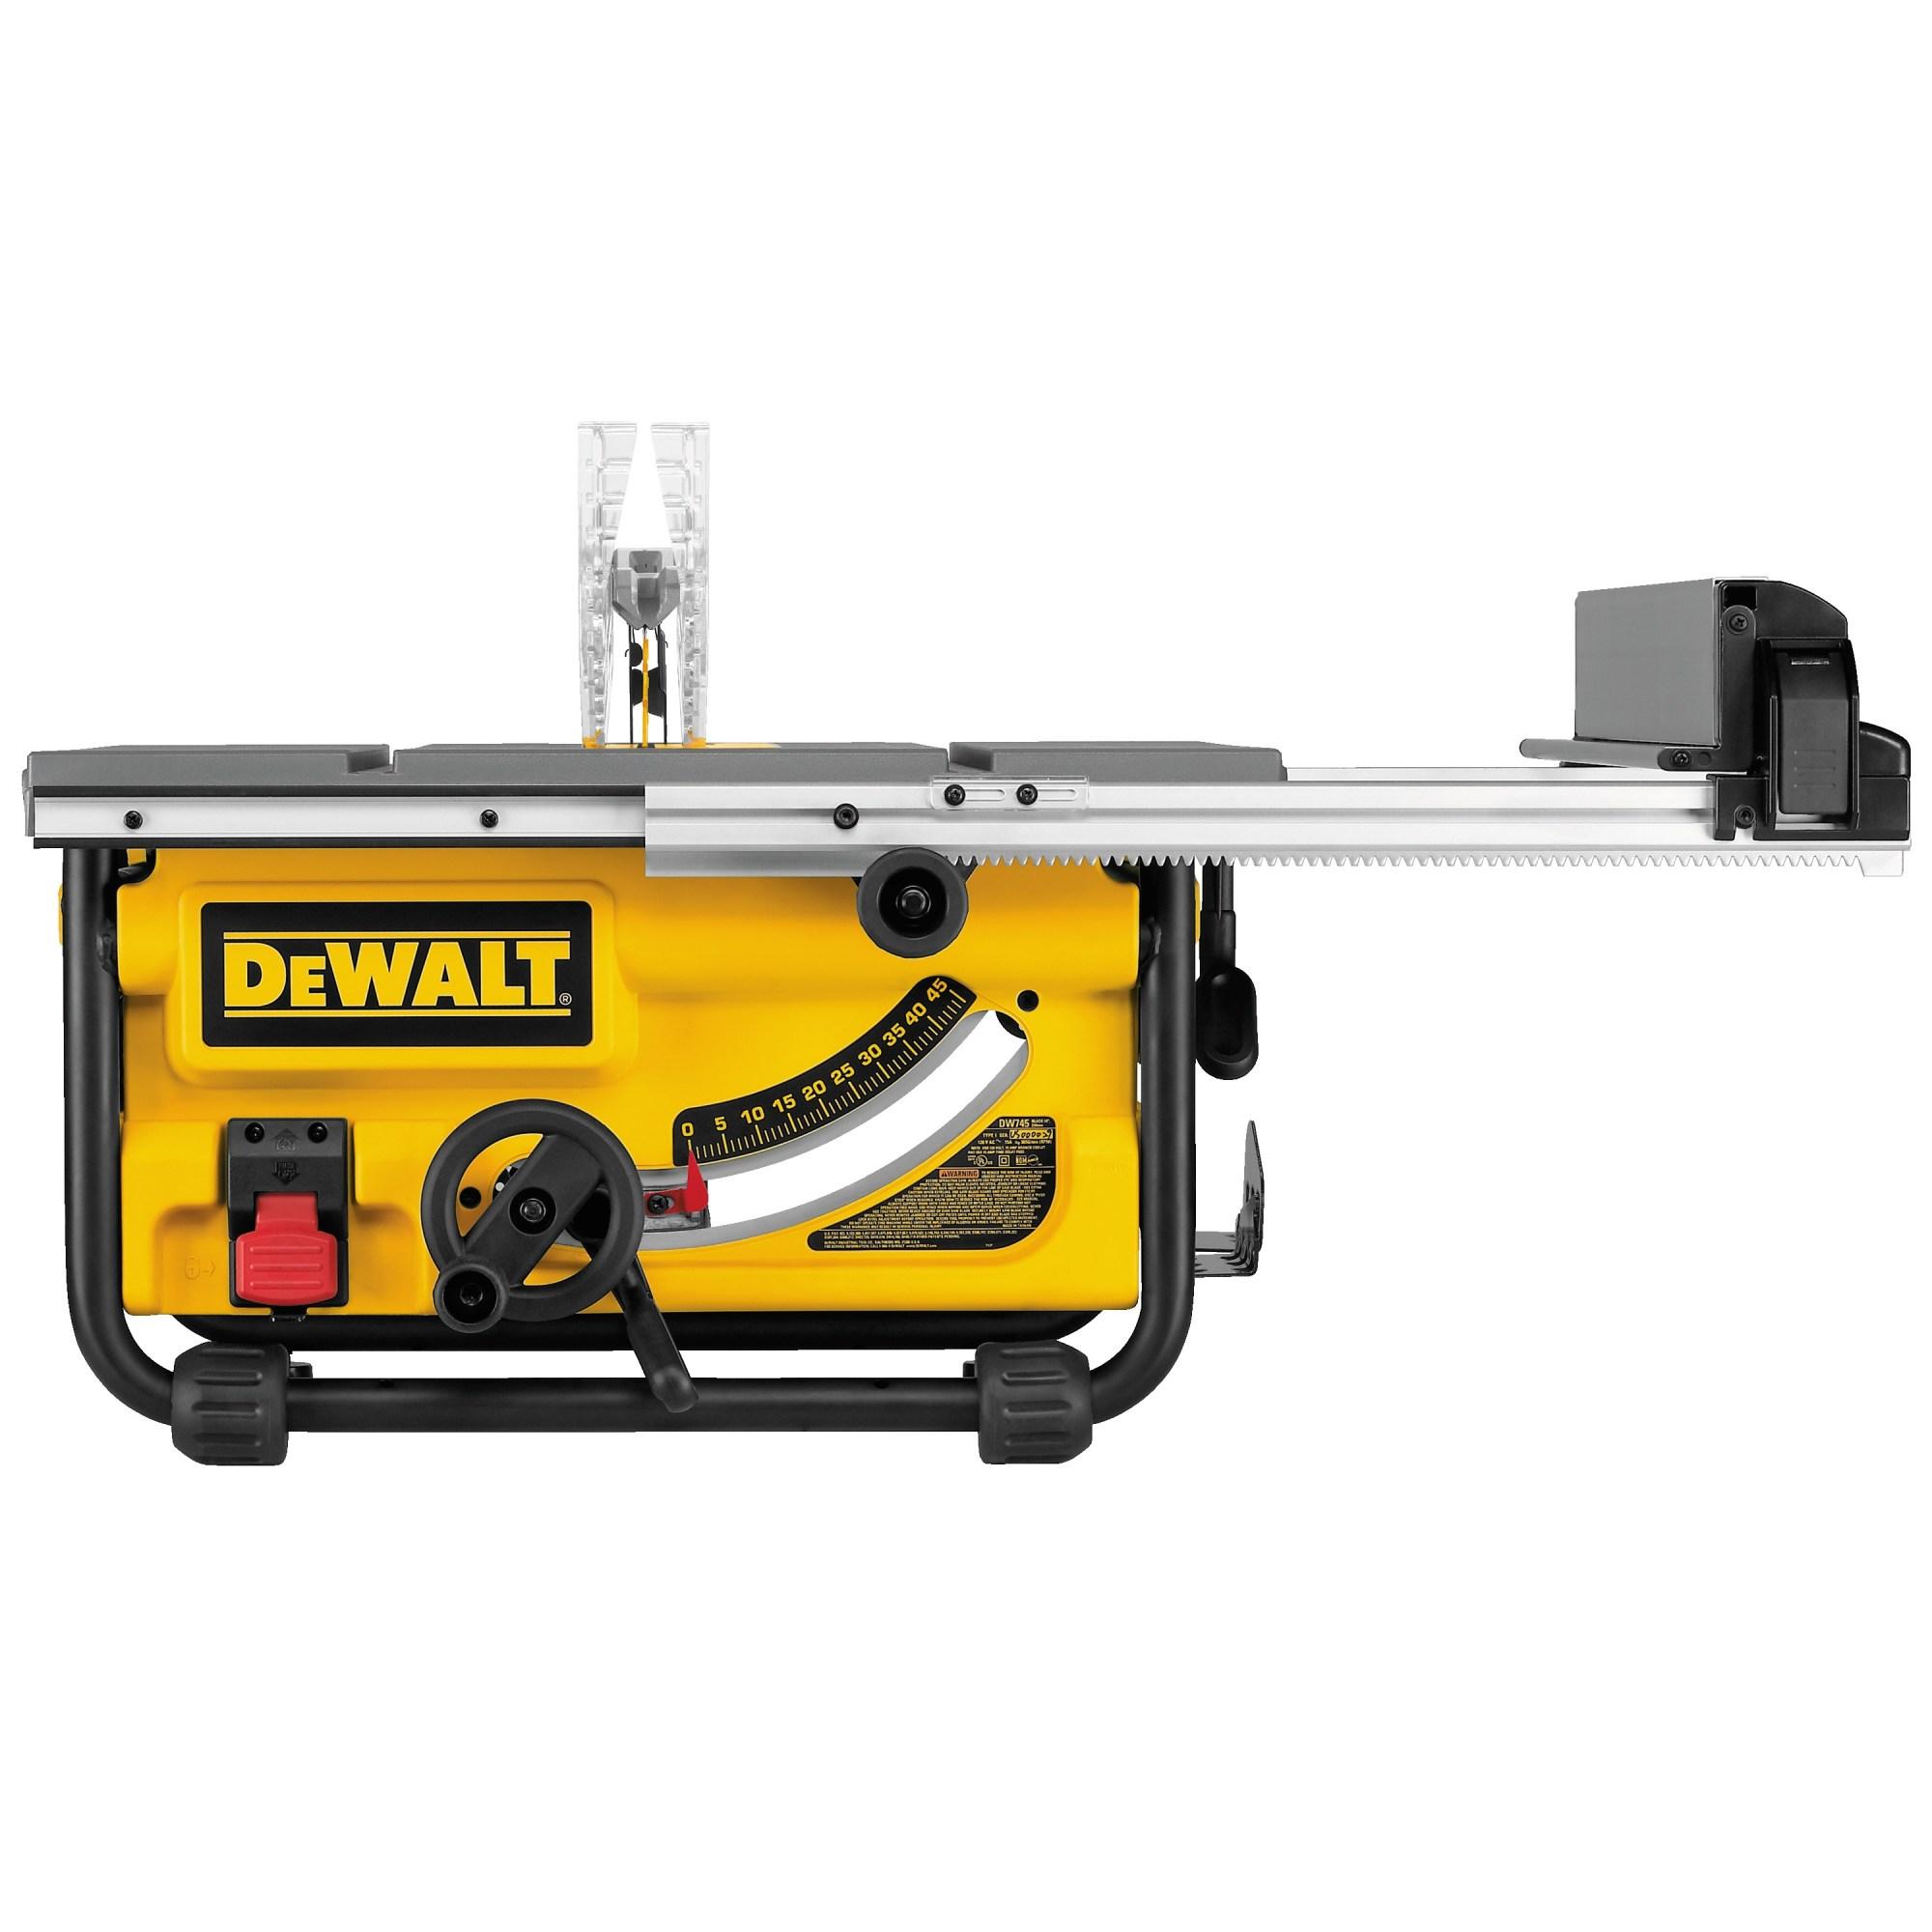 hight resolution of 10 compact job site table saw dw745 dewalt de walt table saw besides wiring 240v outlet further cordless de walt